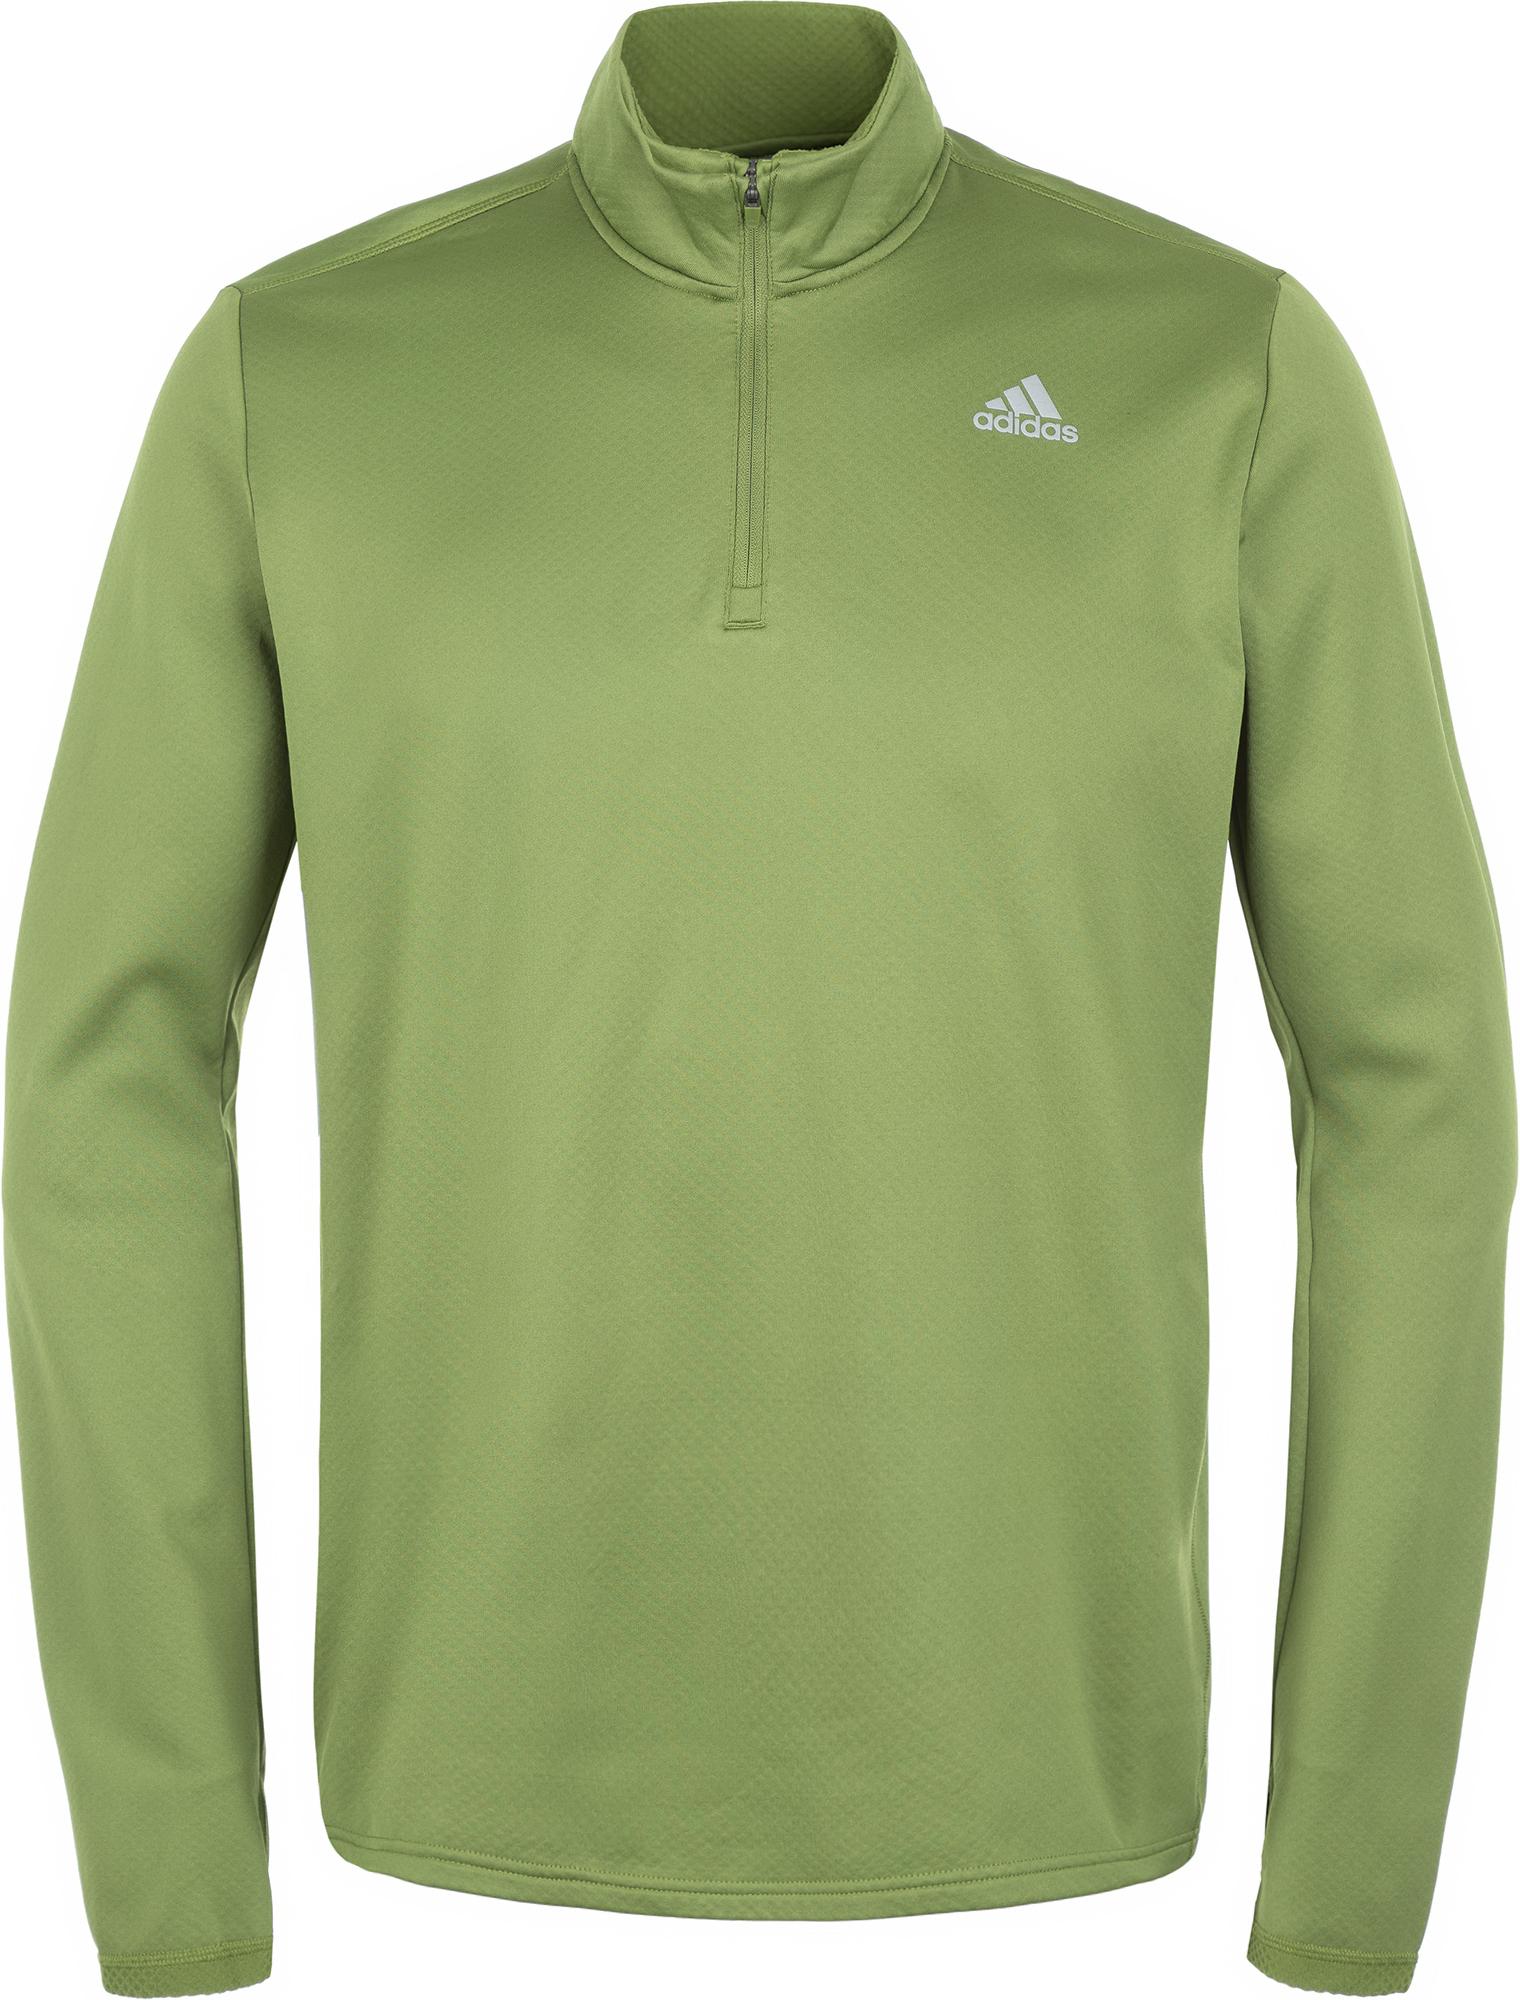 Adidas Лонгслив мужской Response Climawarm 1/4 Zip, размер 54